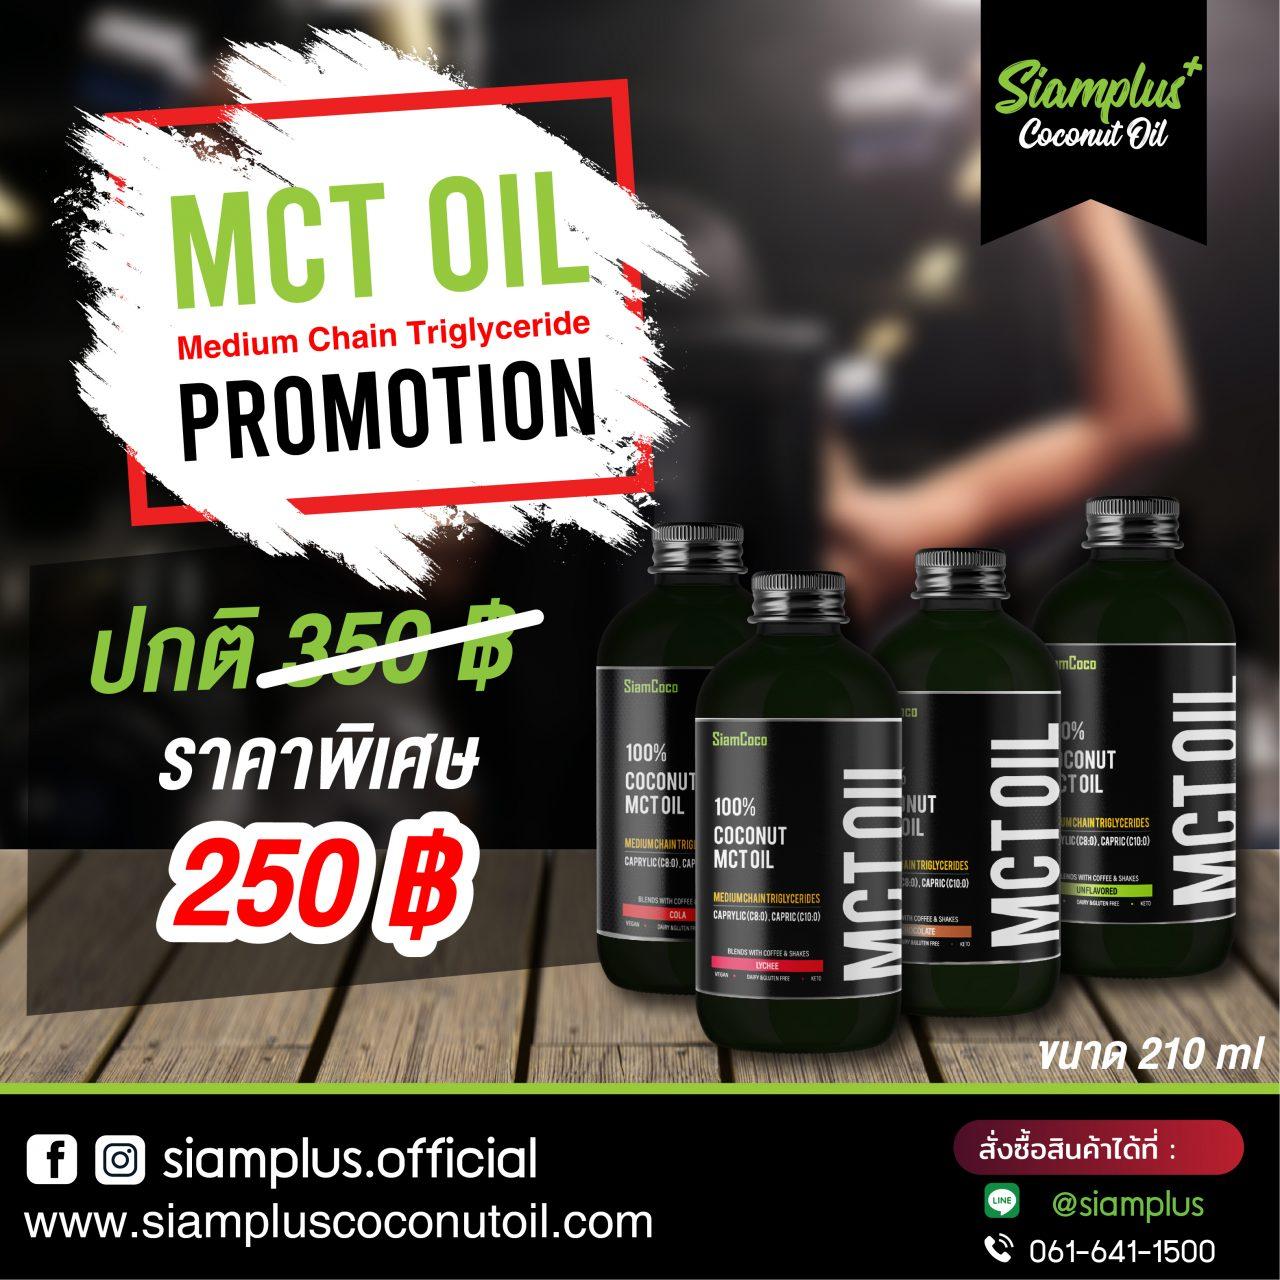 mct-Promotion-1280x1280.jpg